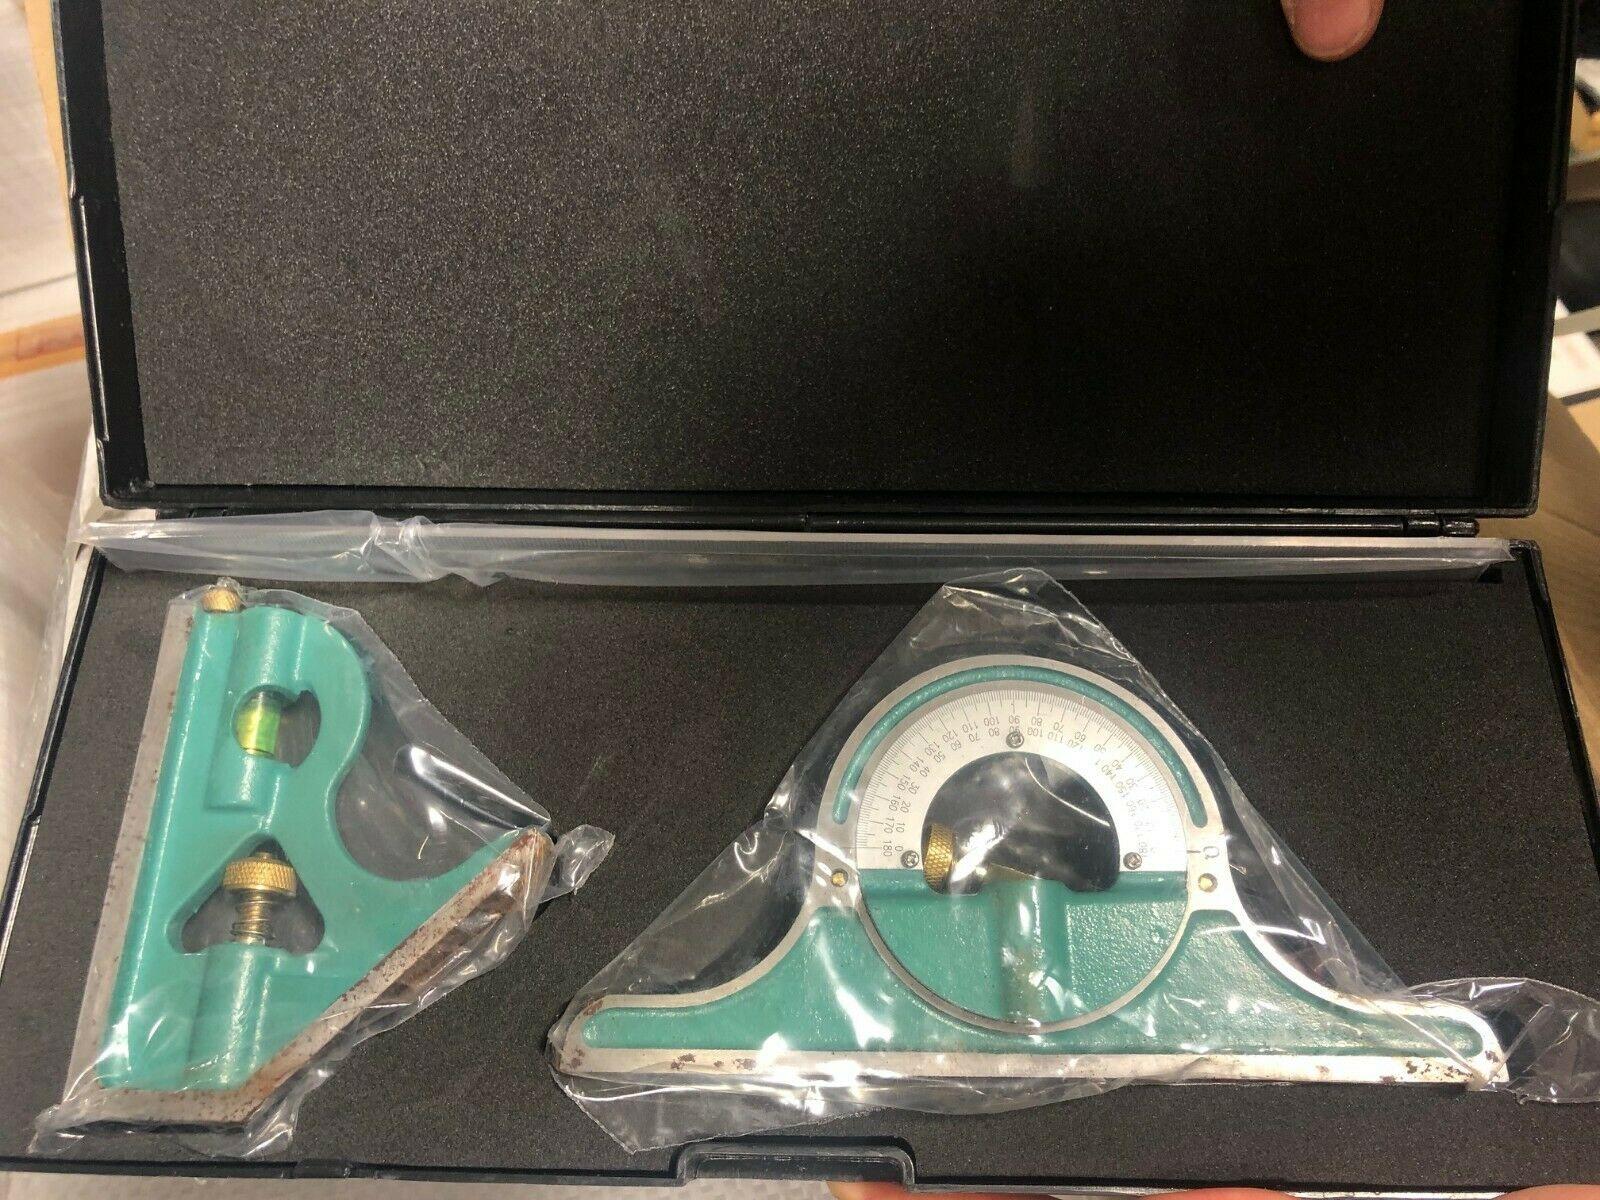 3 Piece Axminster Precision Combination Square Set - £19.96 @ eBay / Axminsteroutletstore